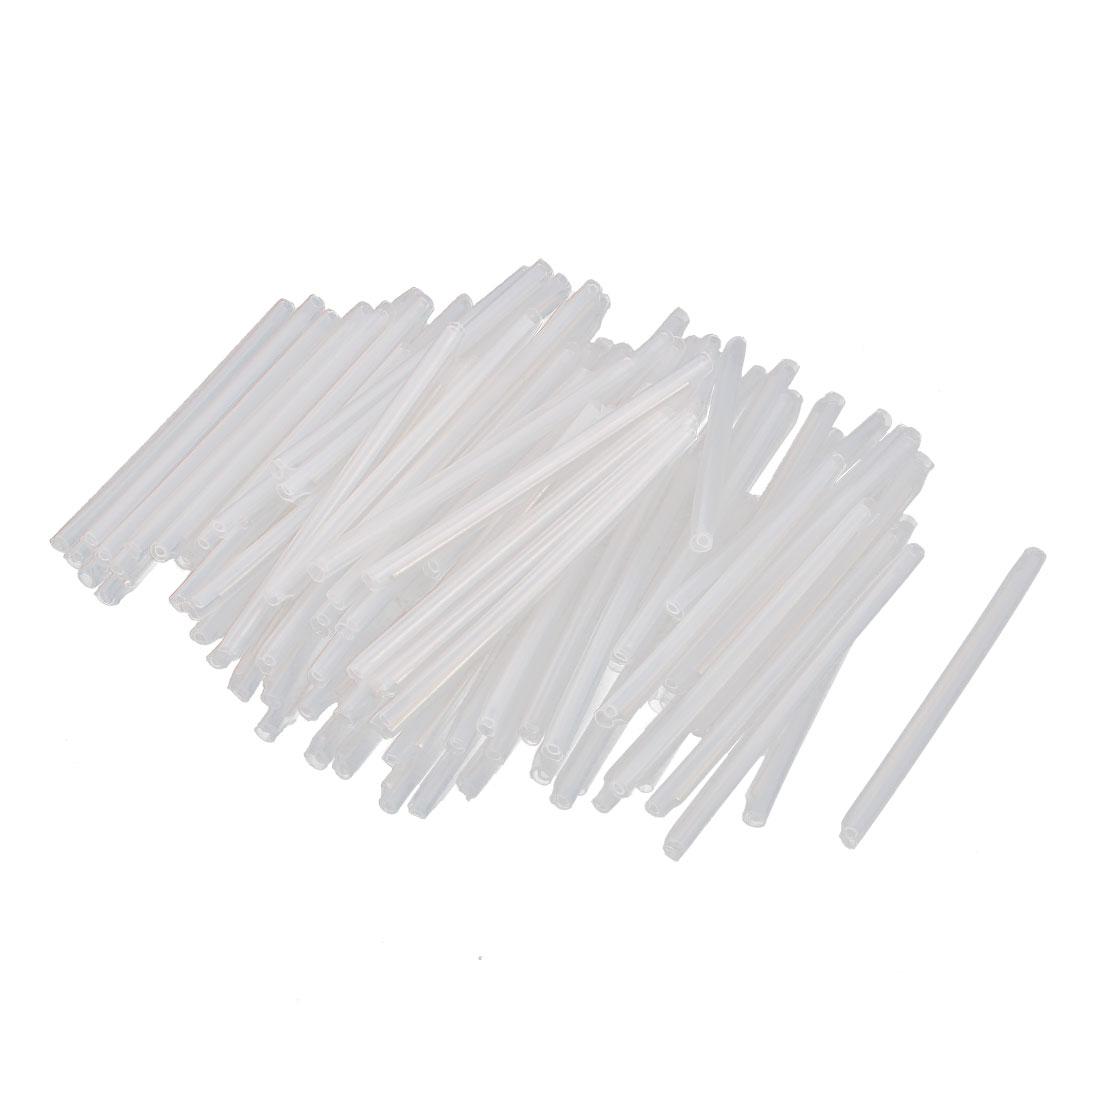 100 Pcs Fiber Optical Protective Sleeve Splicing Tube 58mm Long